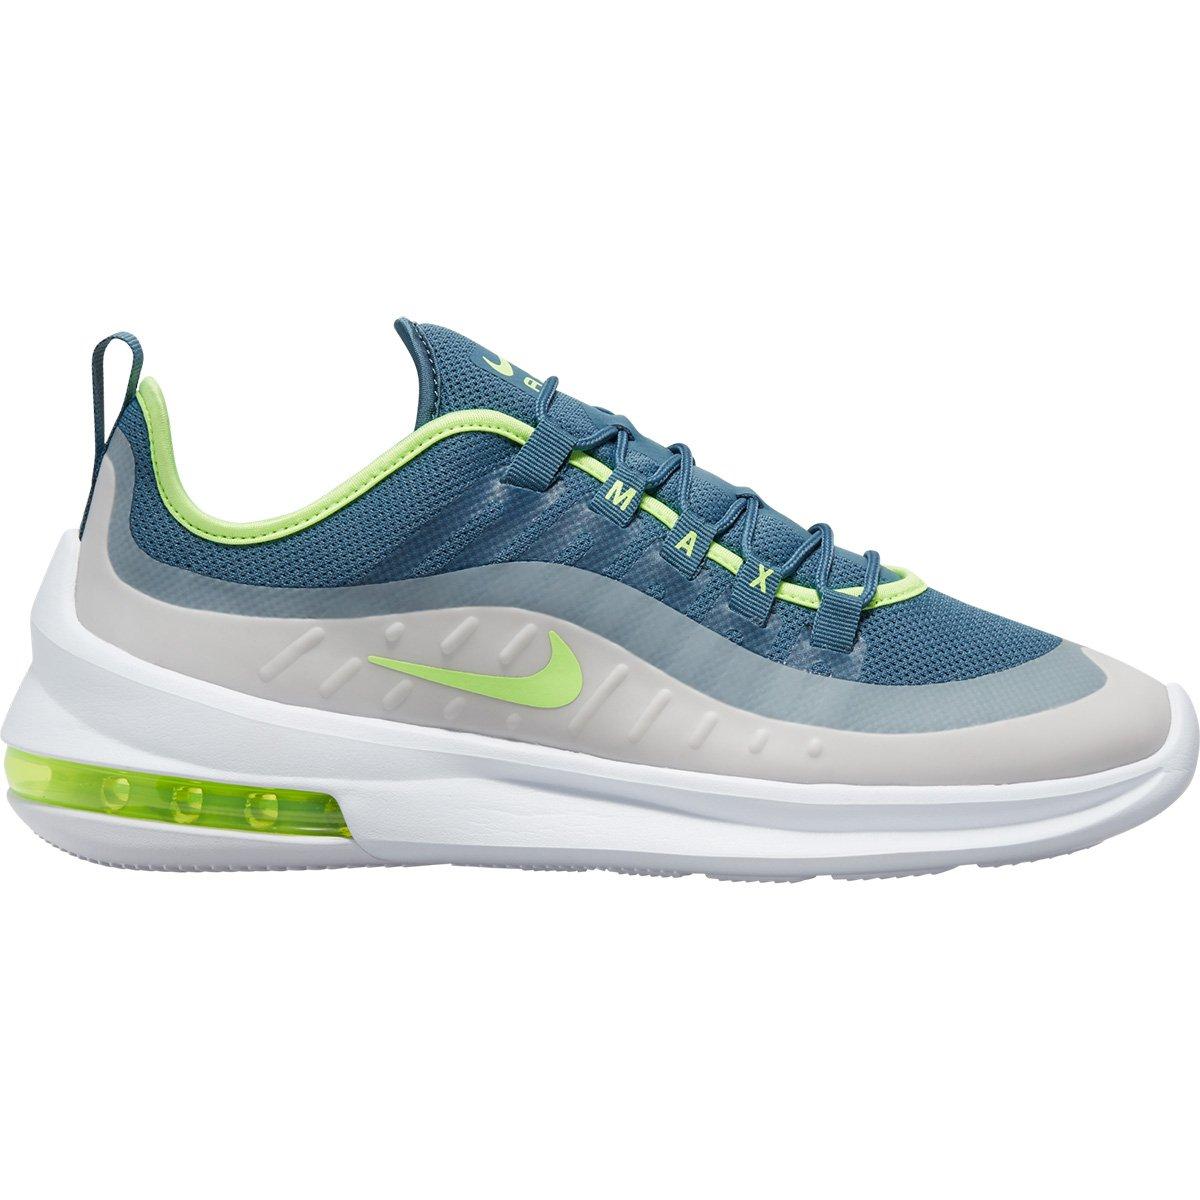 tenis nike air max feminino branco e verde